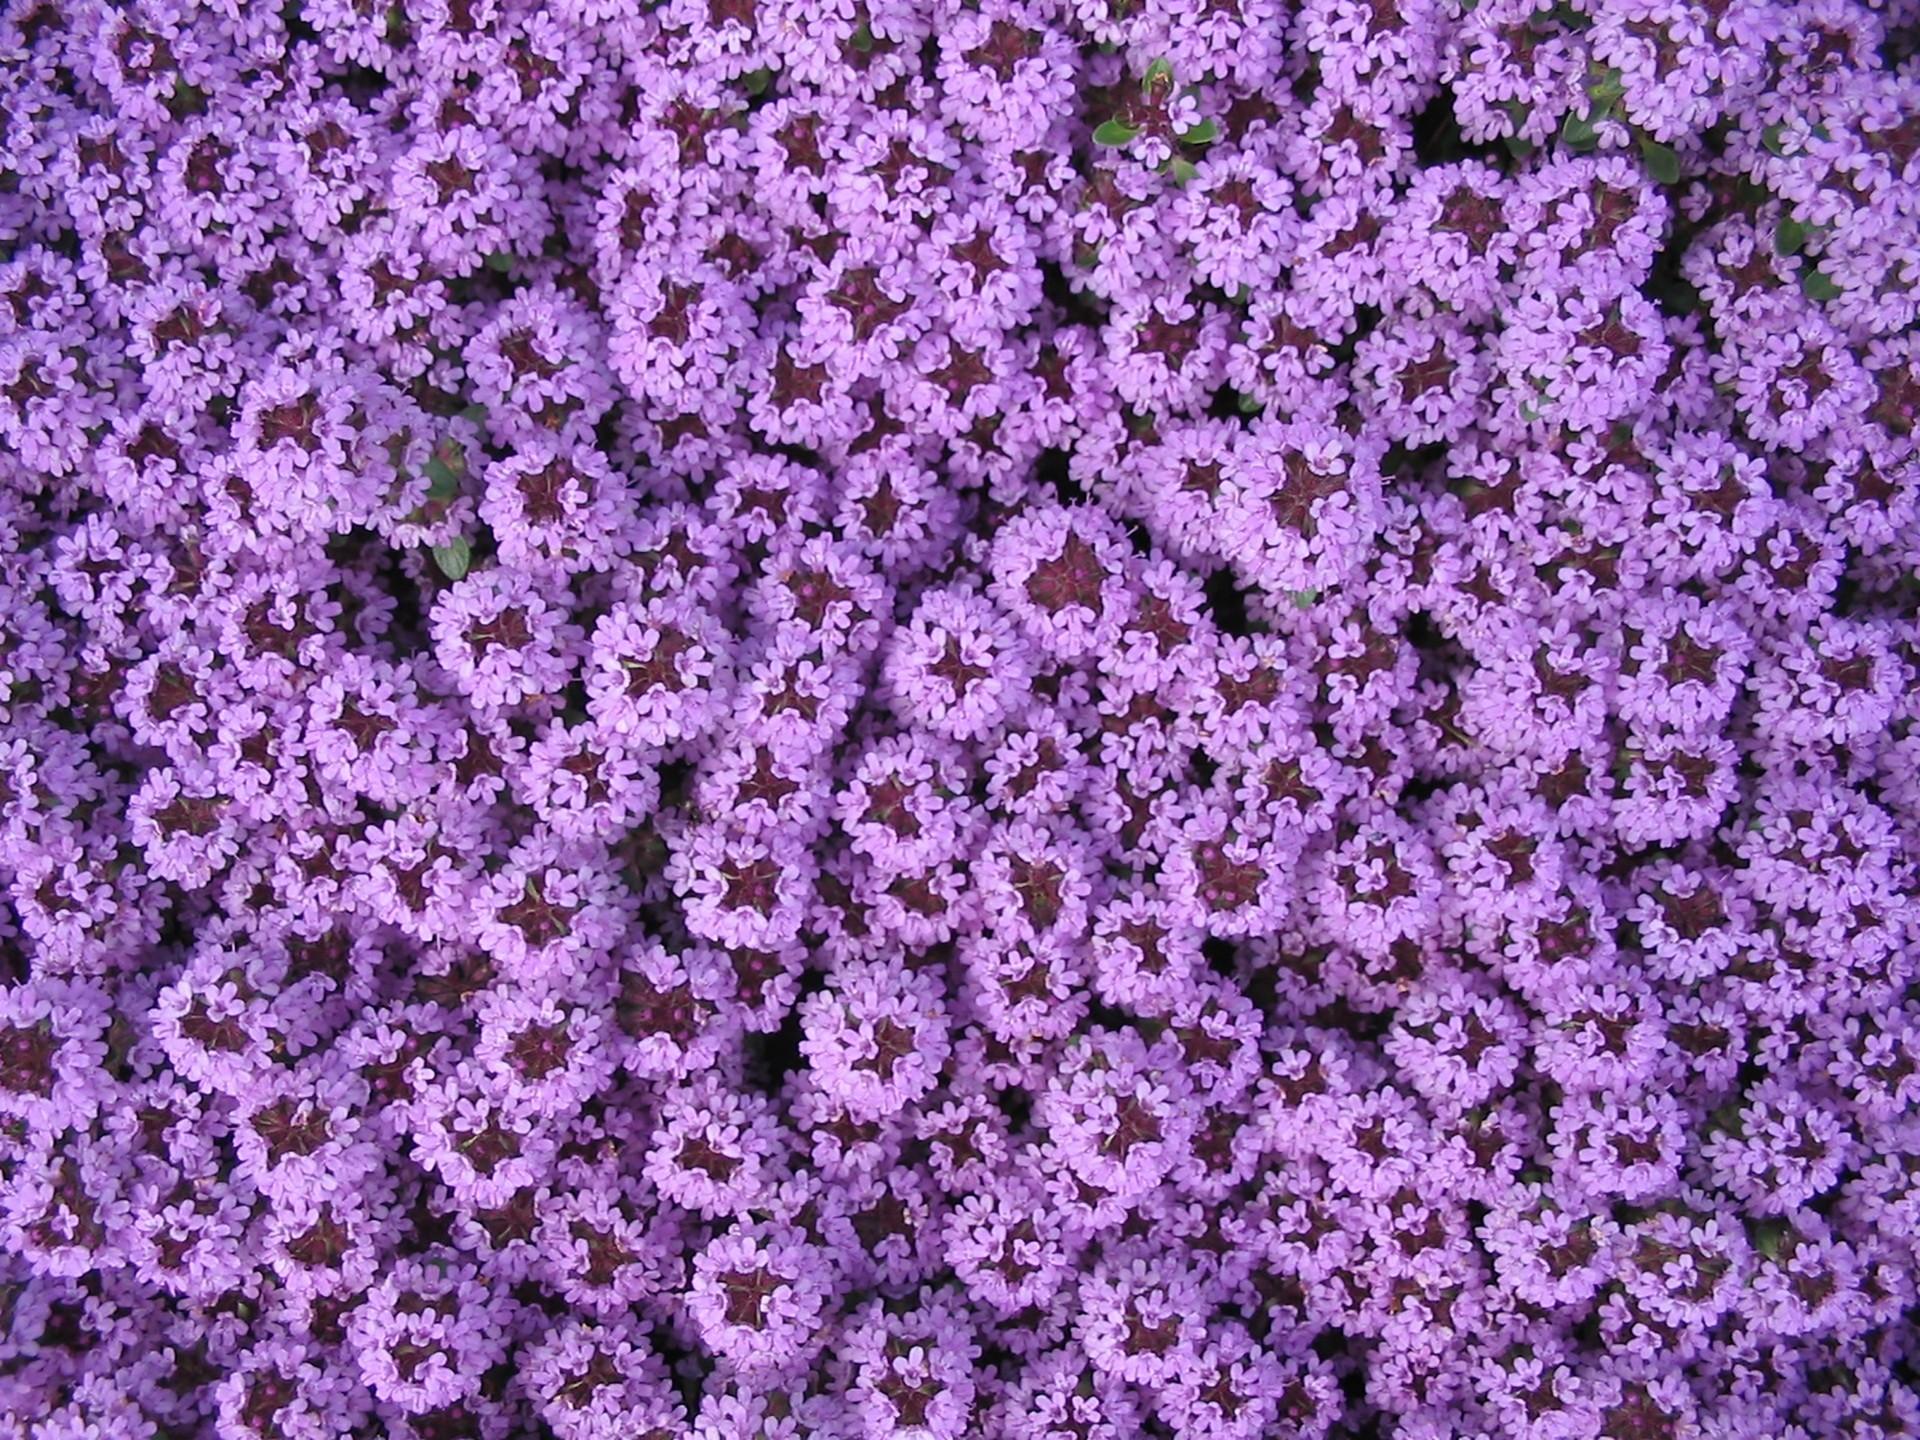 Free Images : blossom, flower, purple, bloom, spring, herb, blue, flora,  background, violet, beautiful, pretty, blossomed, garden design, carpet of  flowers, …